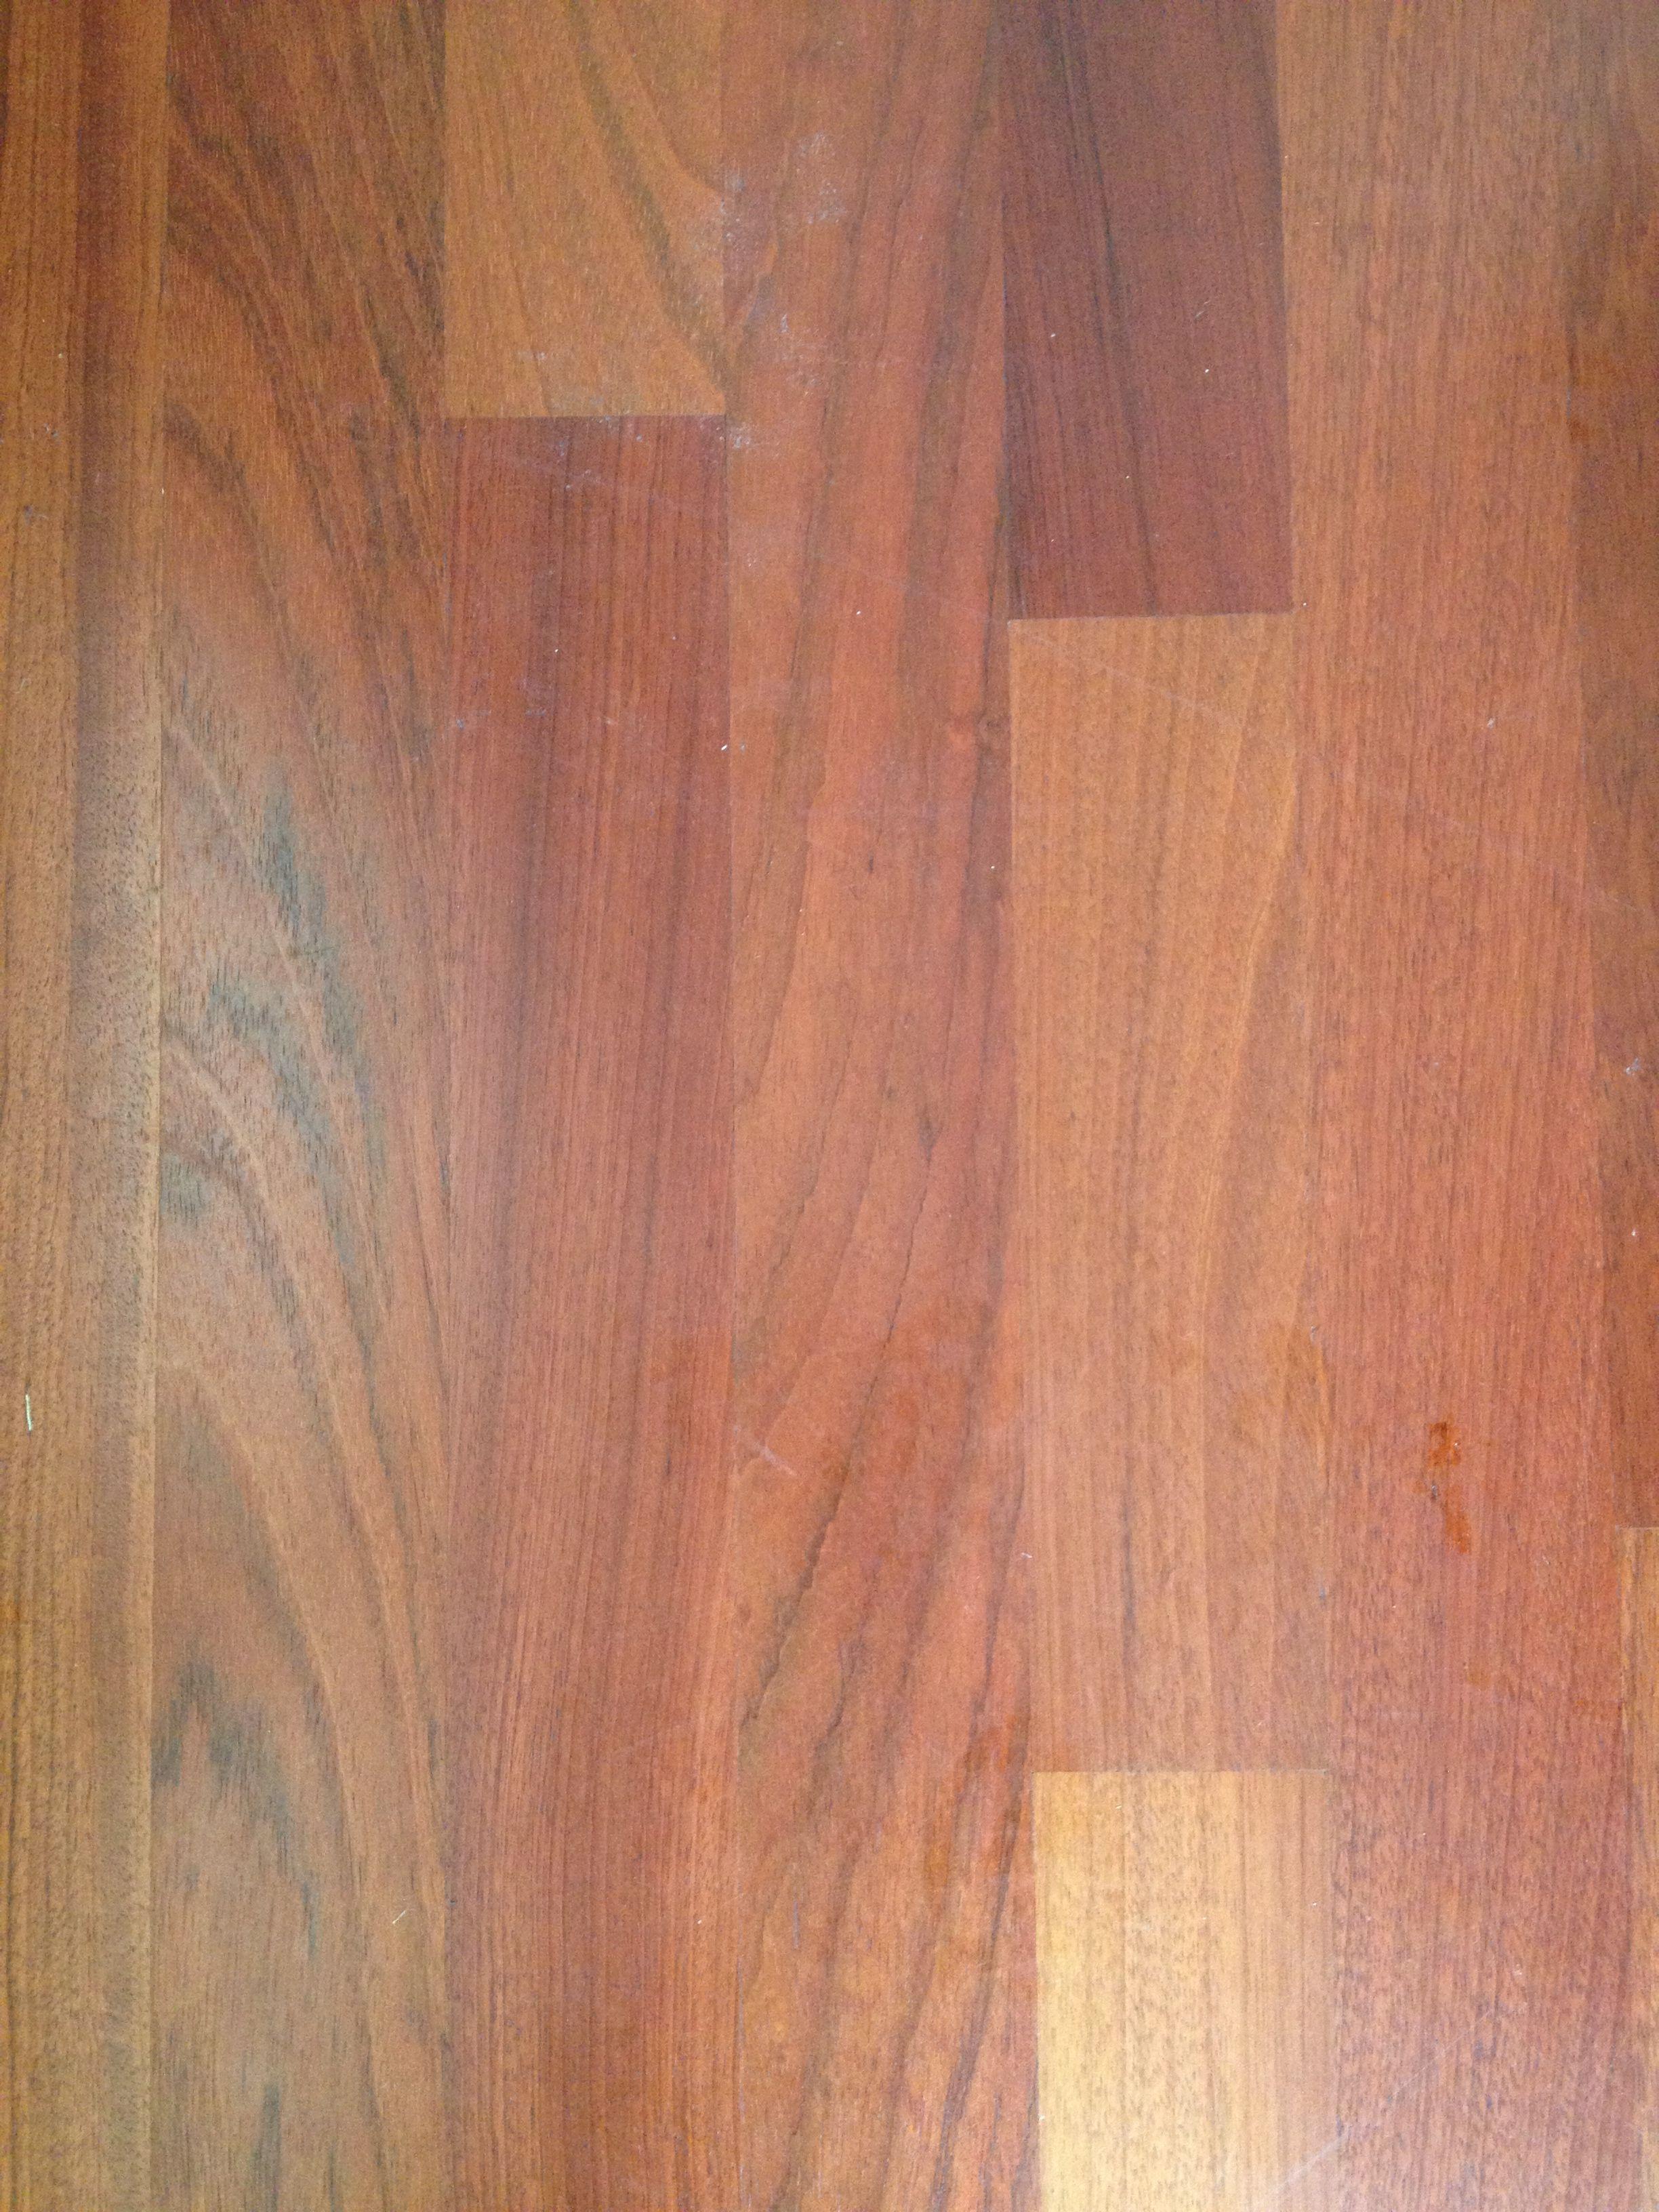 Brazilian cherry floor chulou living room mood board for Brazilian cherry flooring